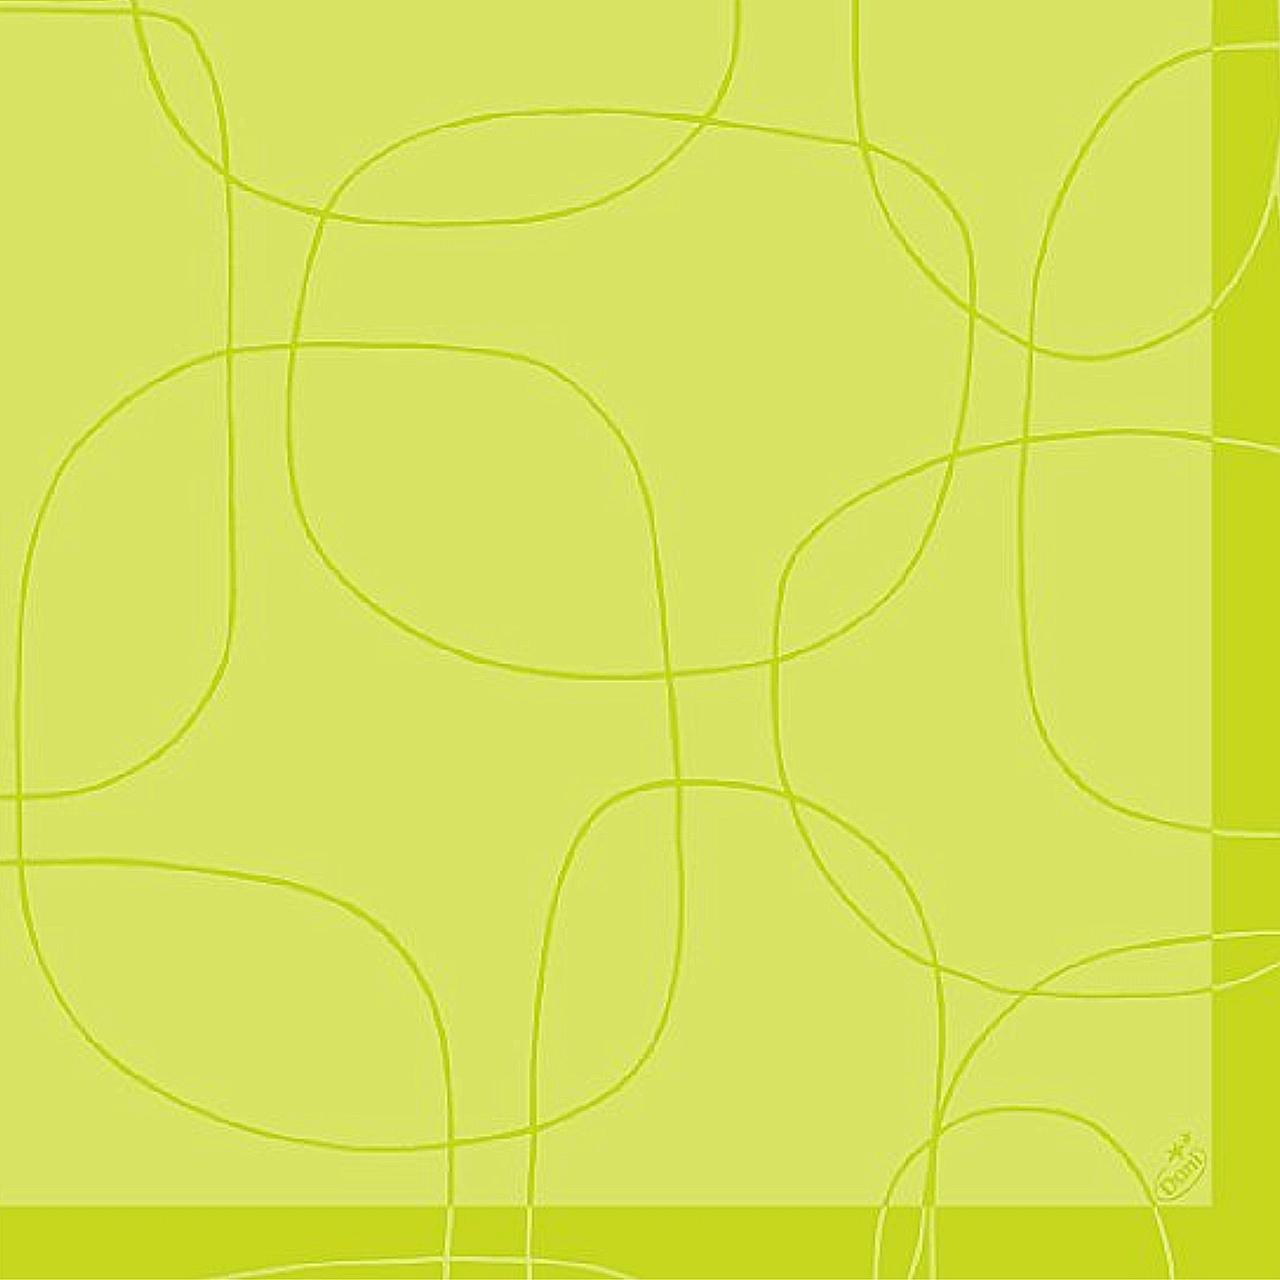 Servetele Kiwi 40 cm chicville 2021